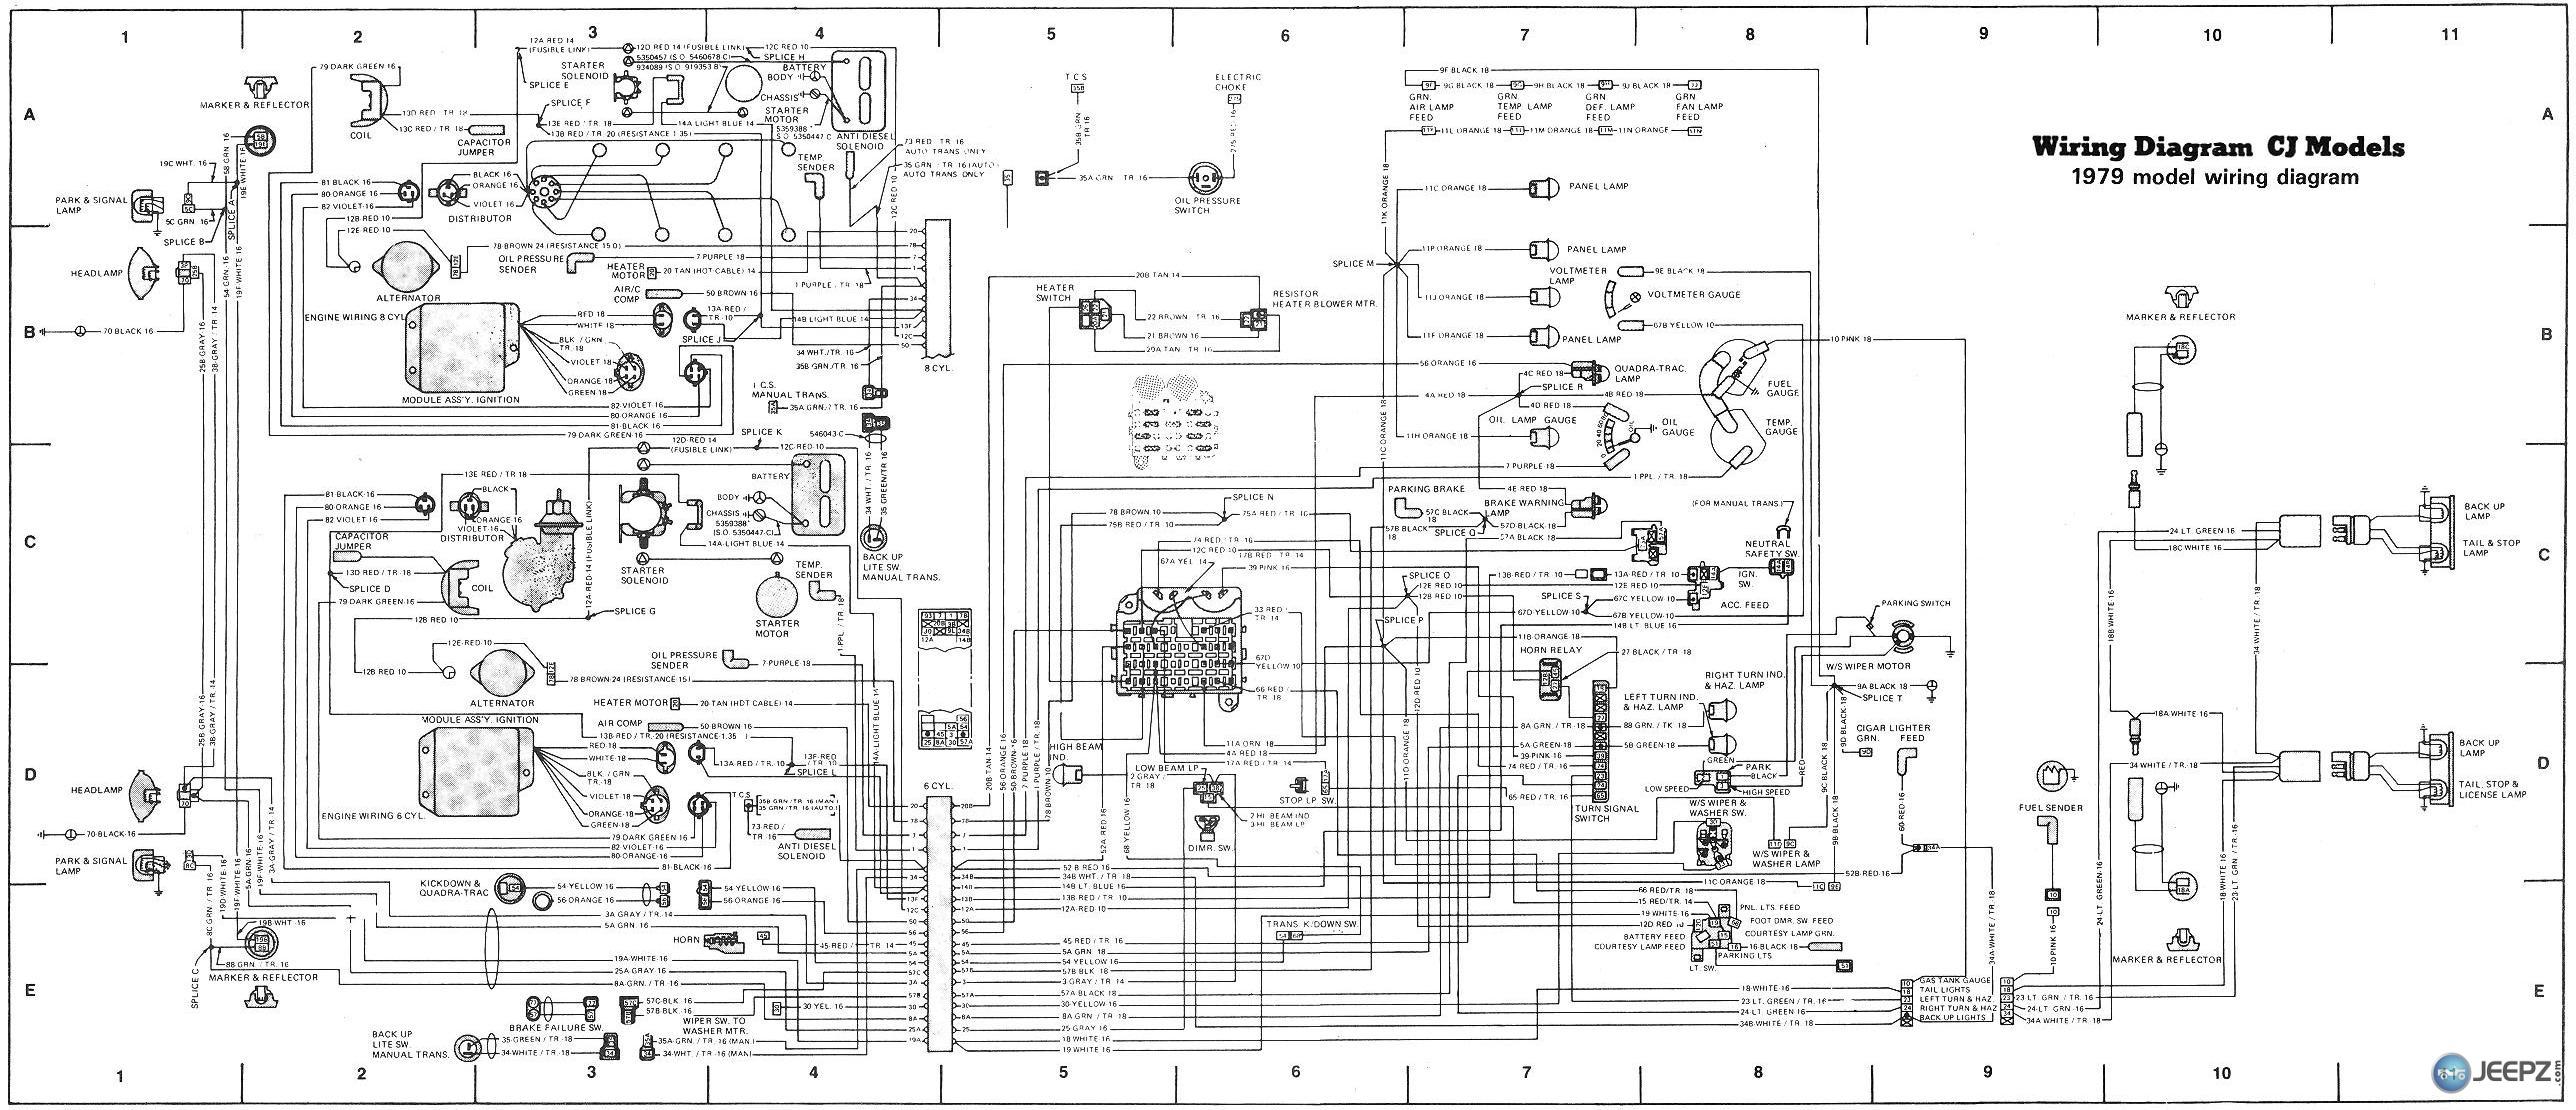 1985 Jeep Cj7 Ignition Wiring Diagram | Wiring Diagram Jk Ignition Wiring Diagram on